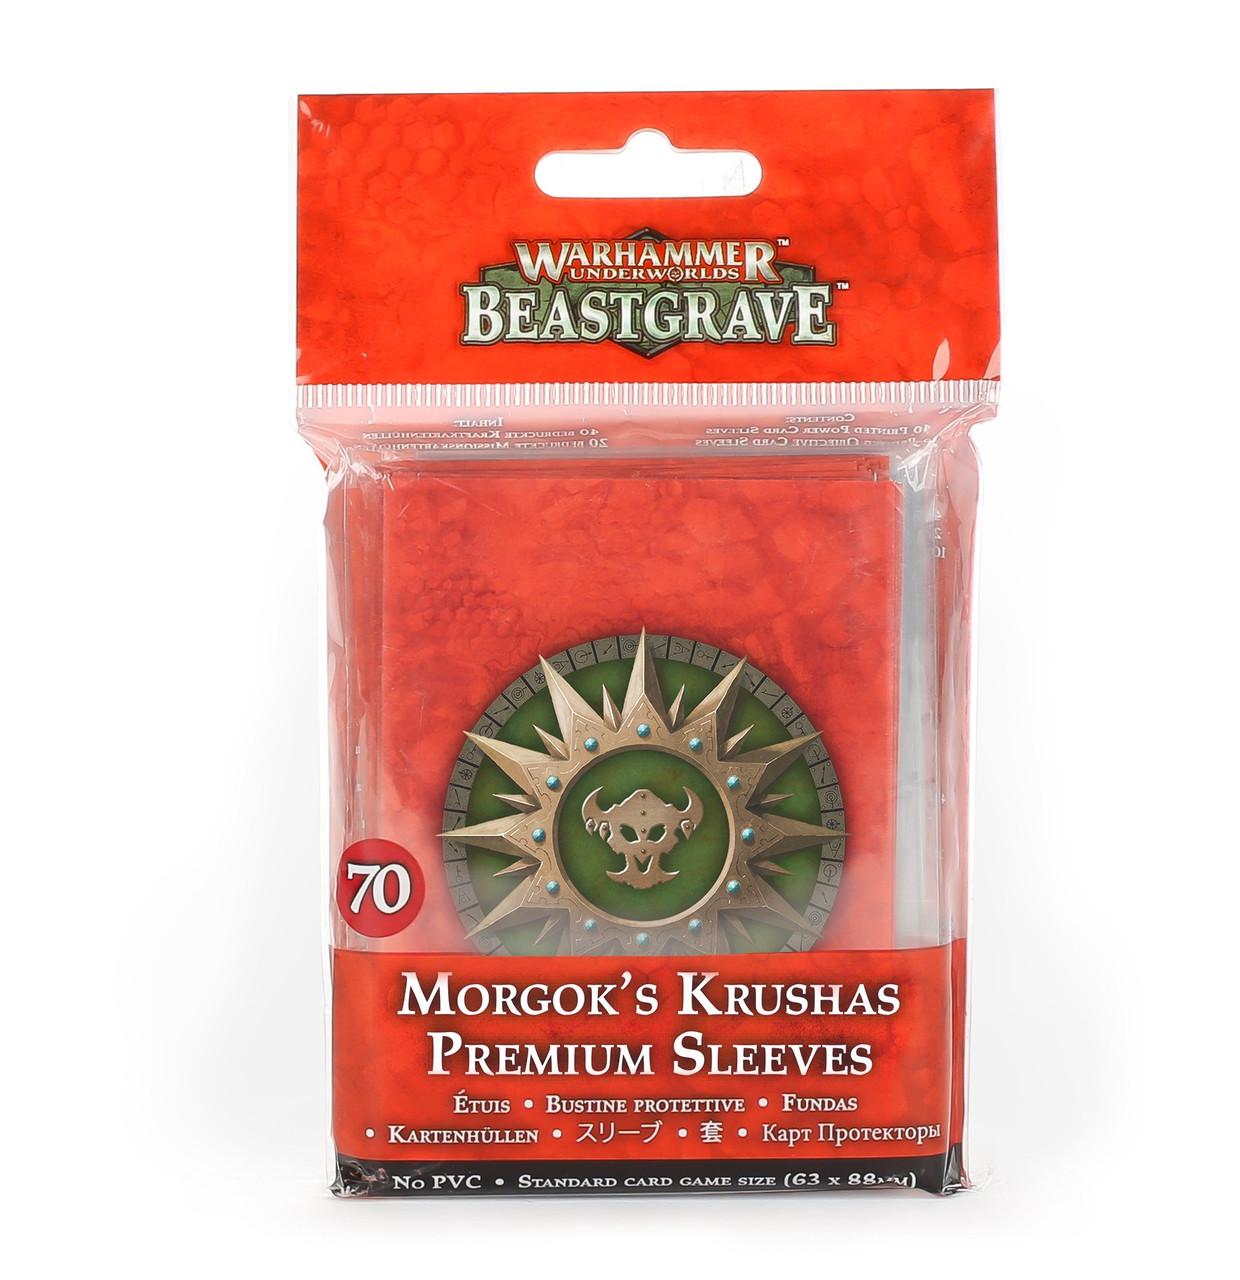 Warhammer Underworlds Beastgrave Morgok/'s Krushas Card Singles